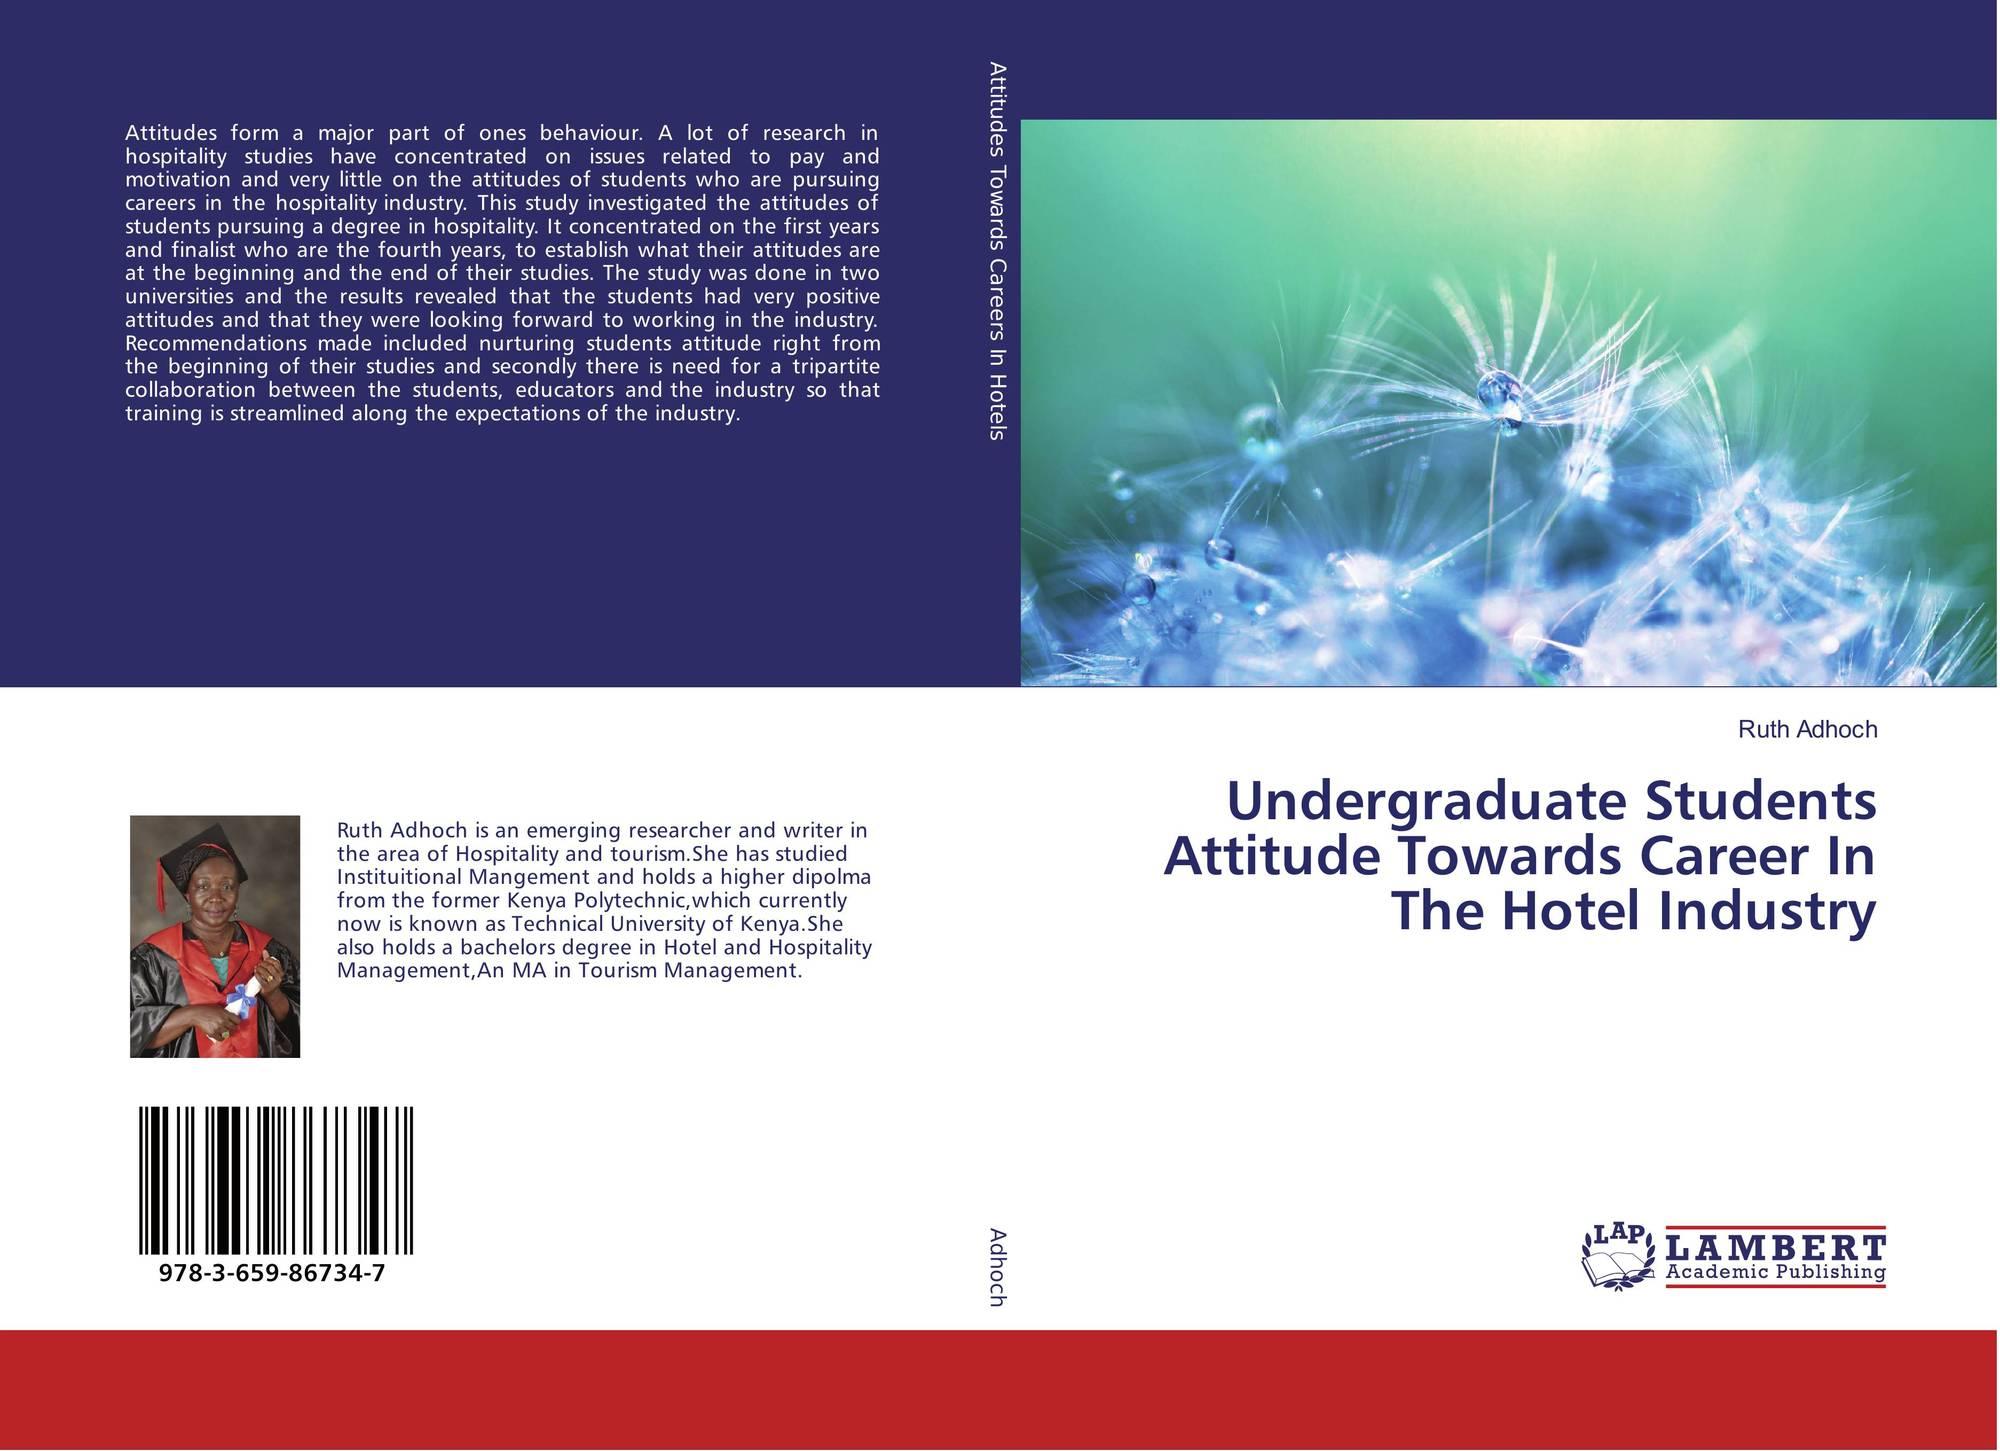 Undergraduate Students Attitude Towards Career In The Hotel